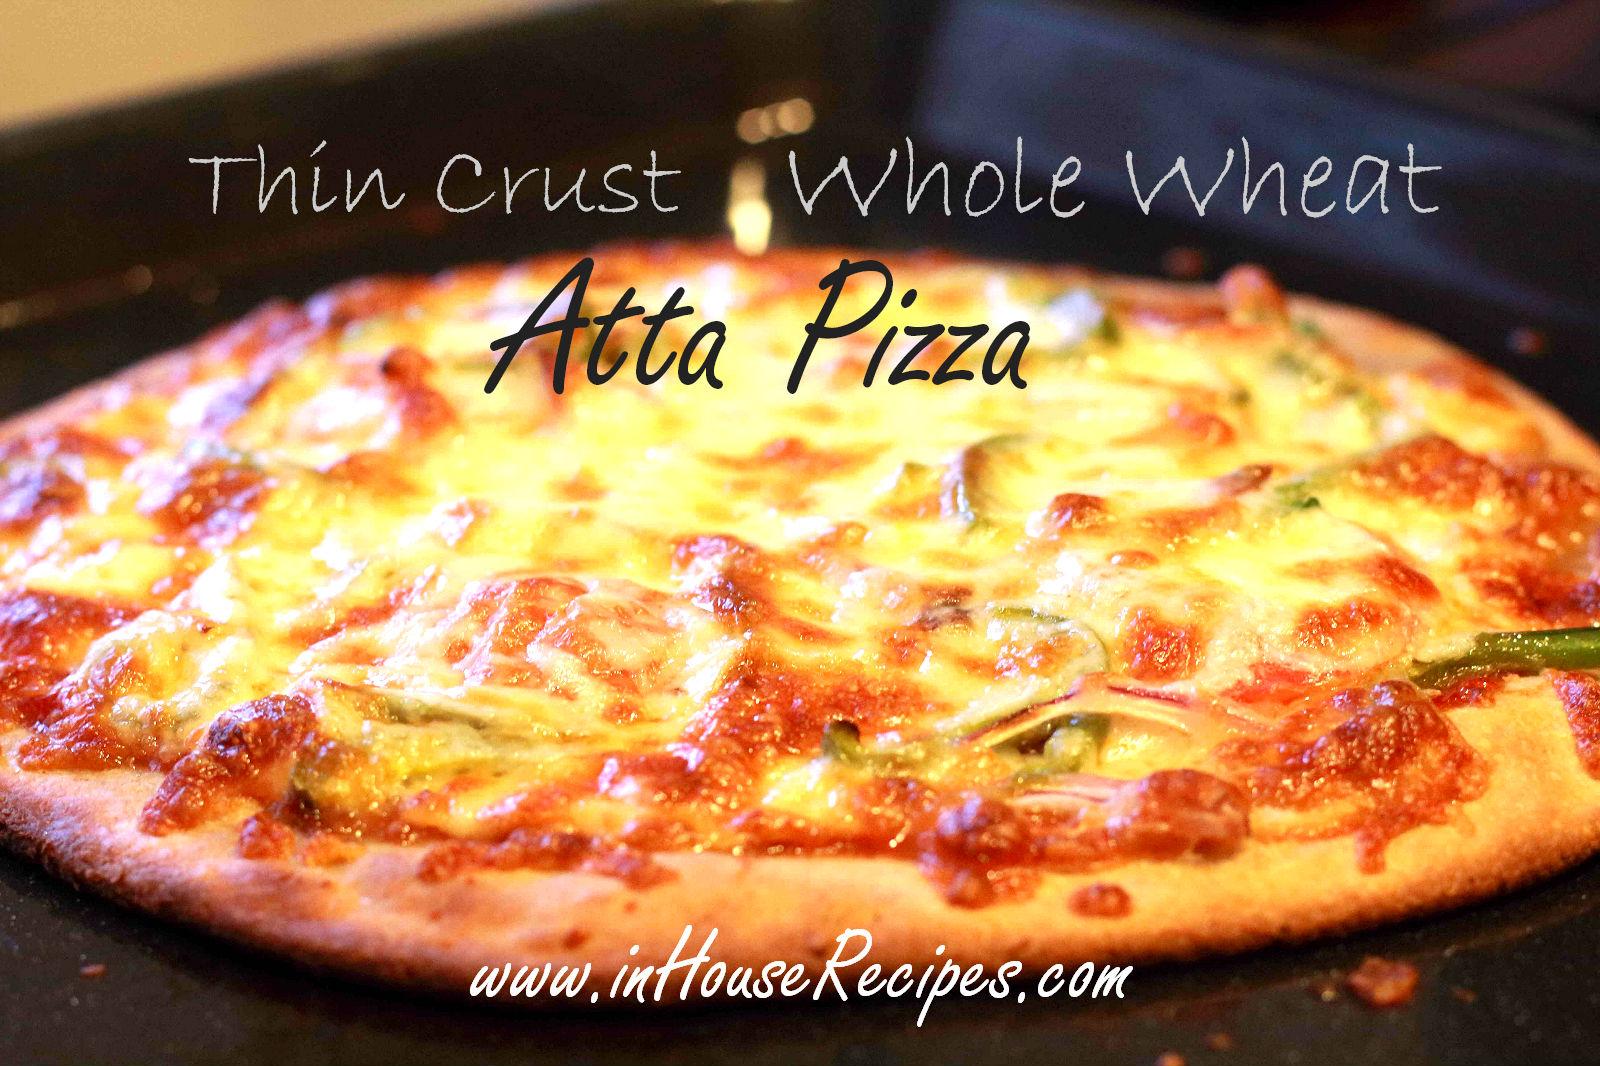 Thin crust whole wheat atta pizza recipe inhouserecipes forumfinder Gallery